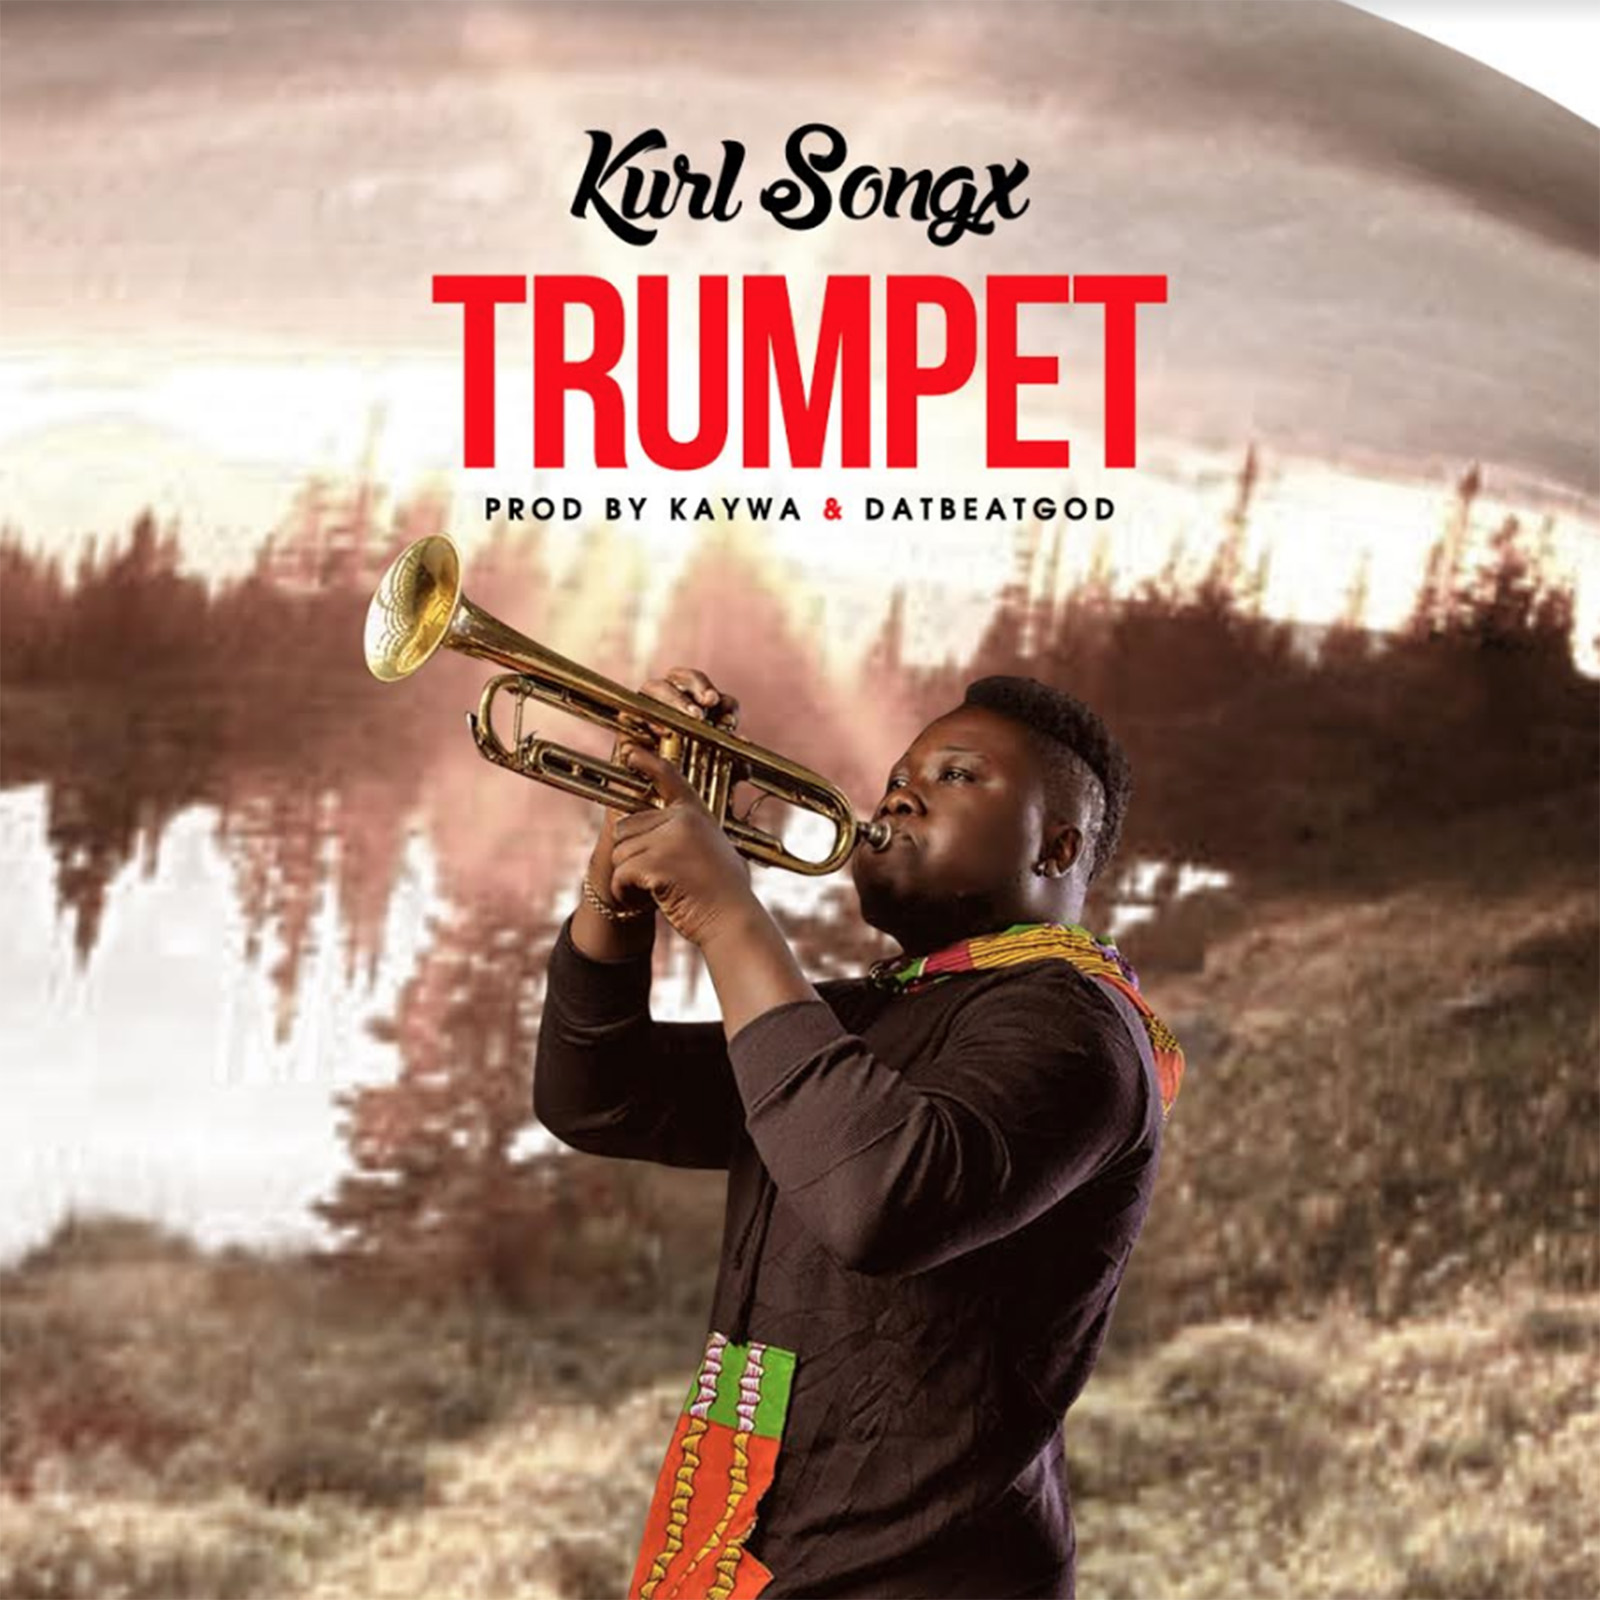 Trumpet by Kurl Songx